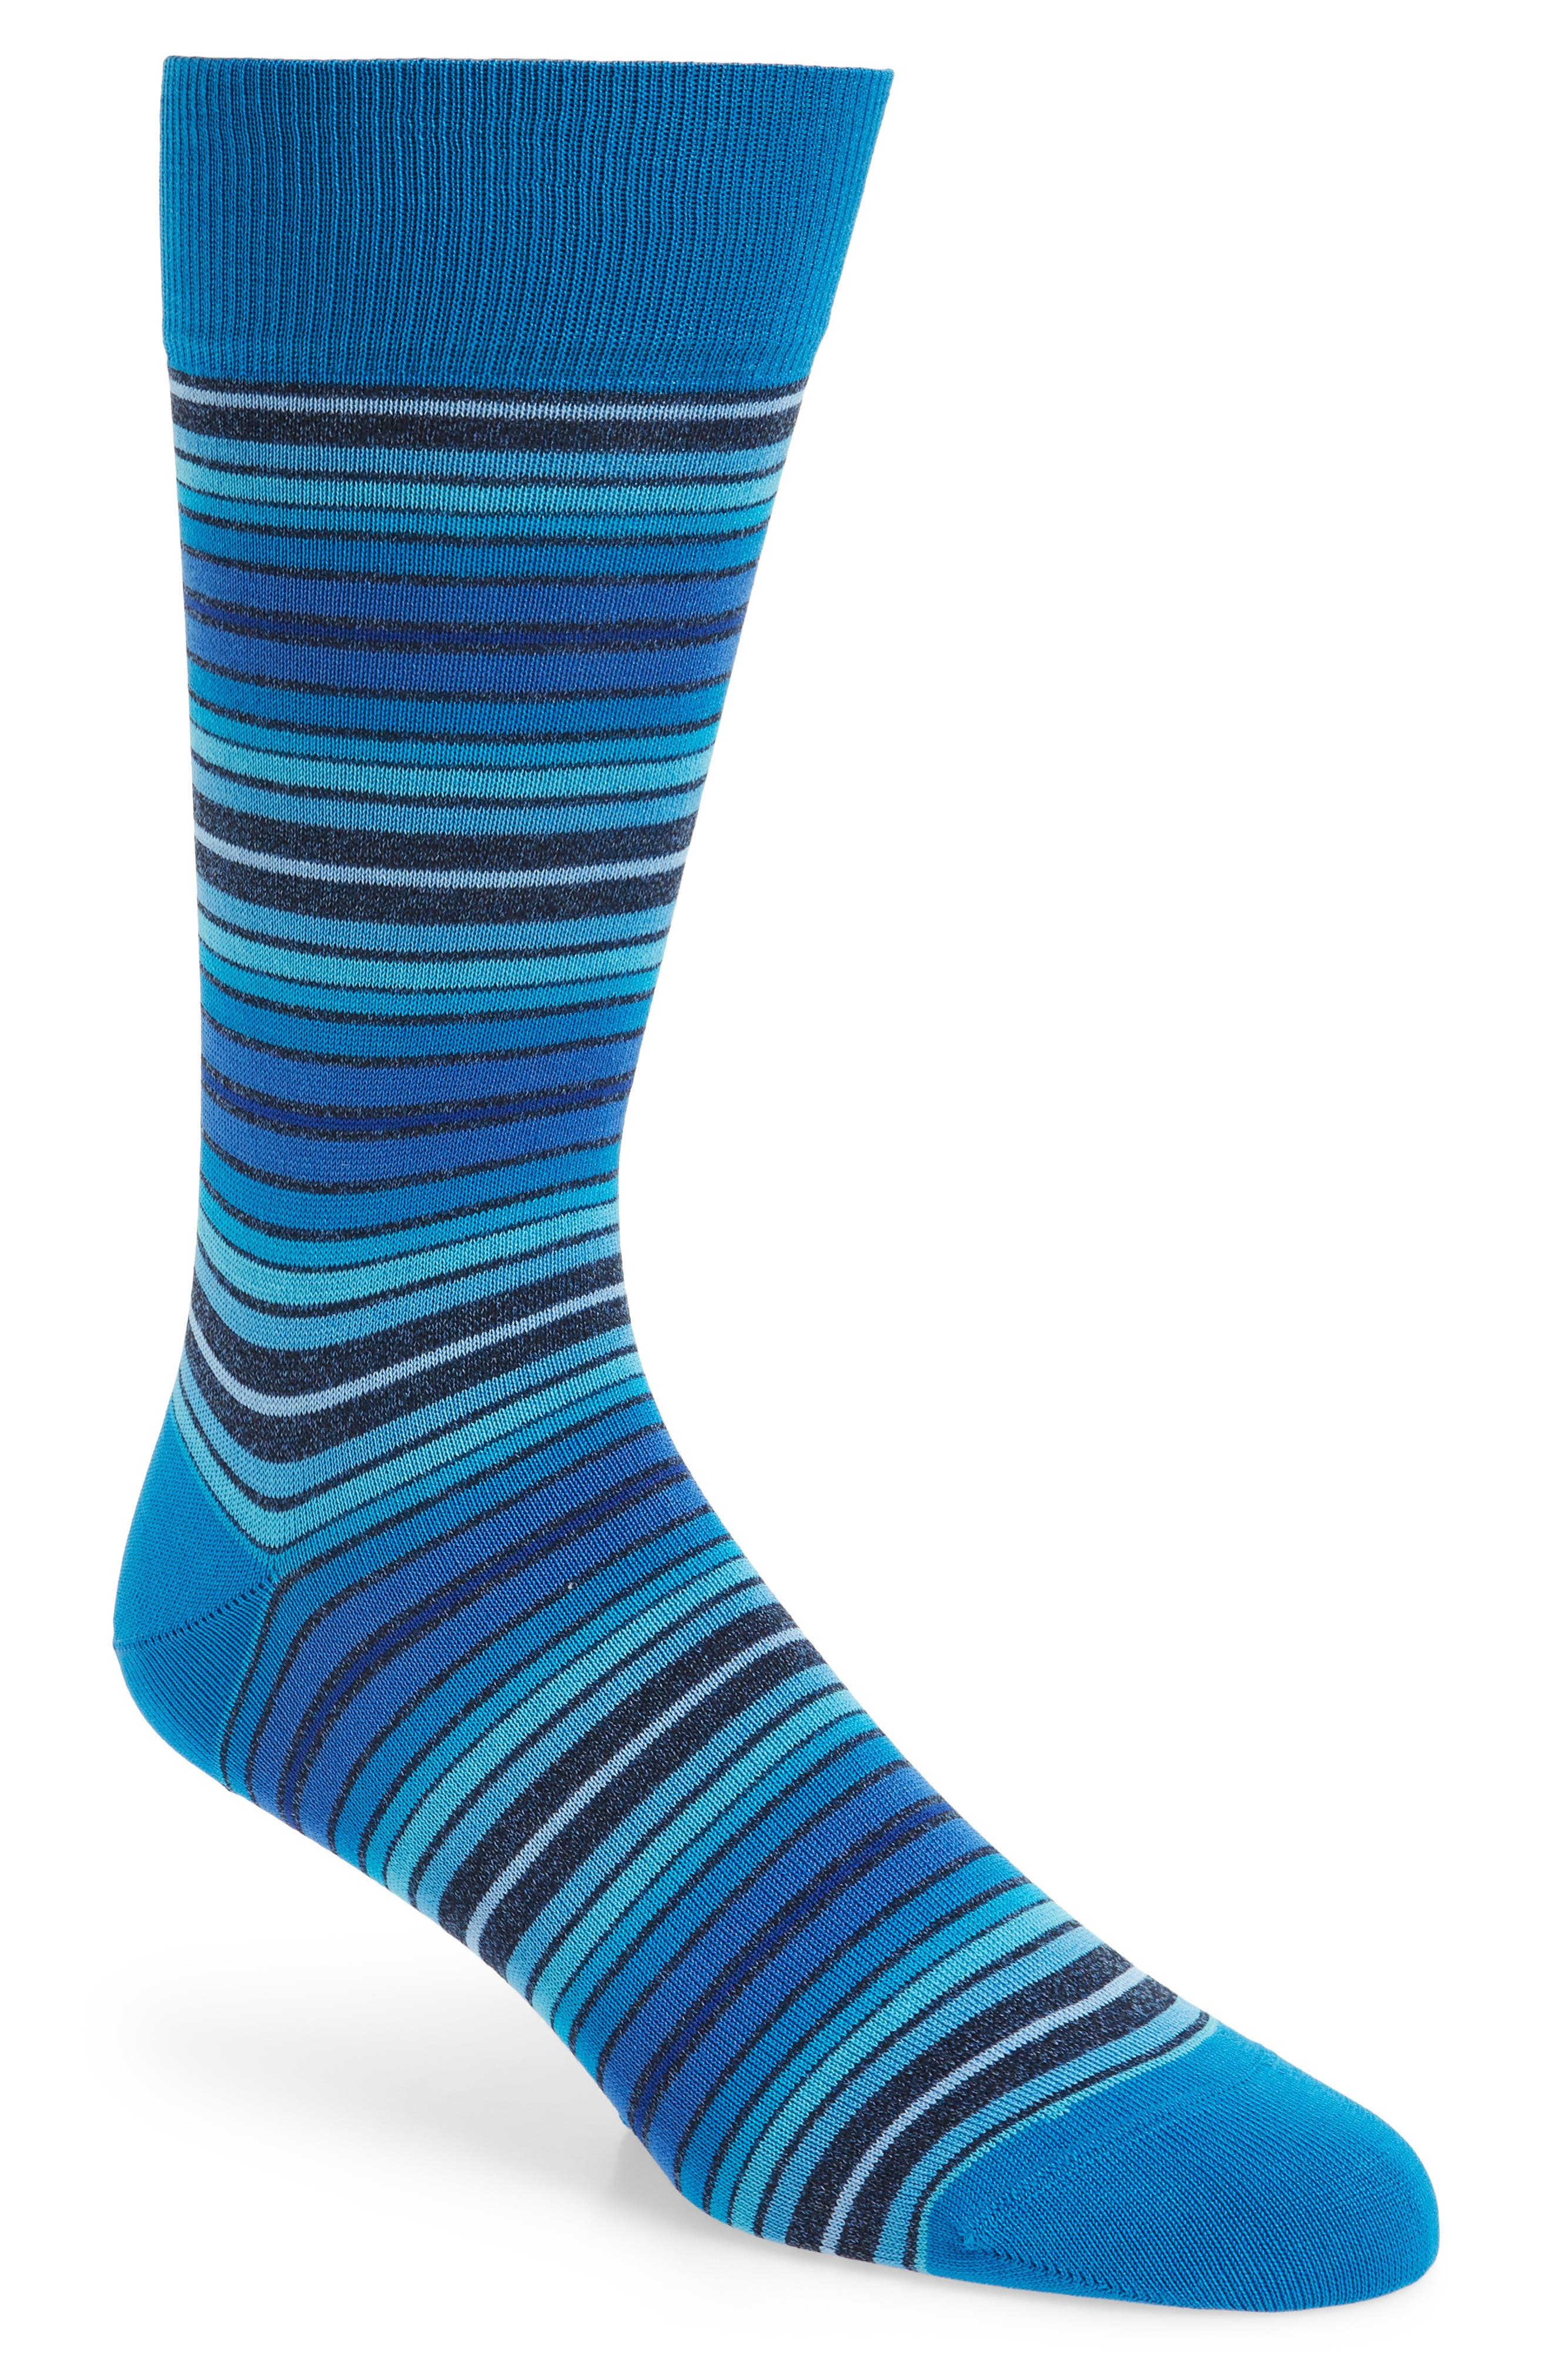 Cotton Blend Socks,                             Main thumbnail 1, color,                             Aqua